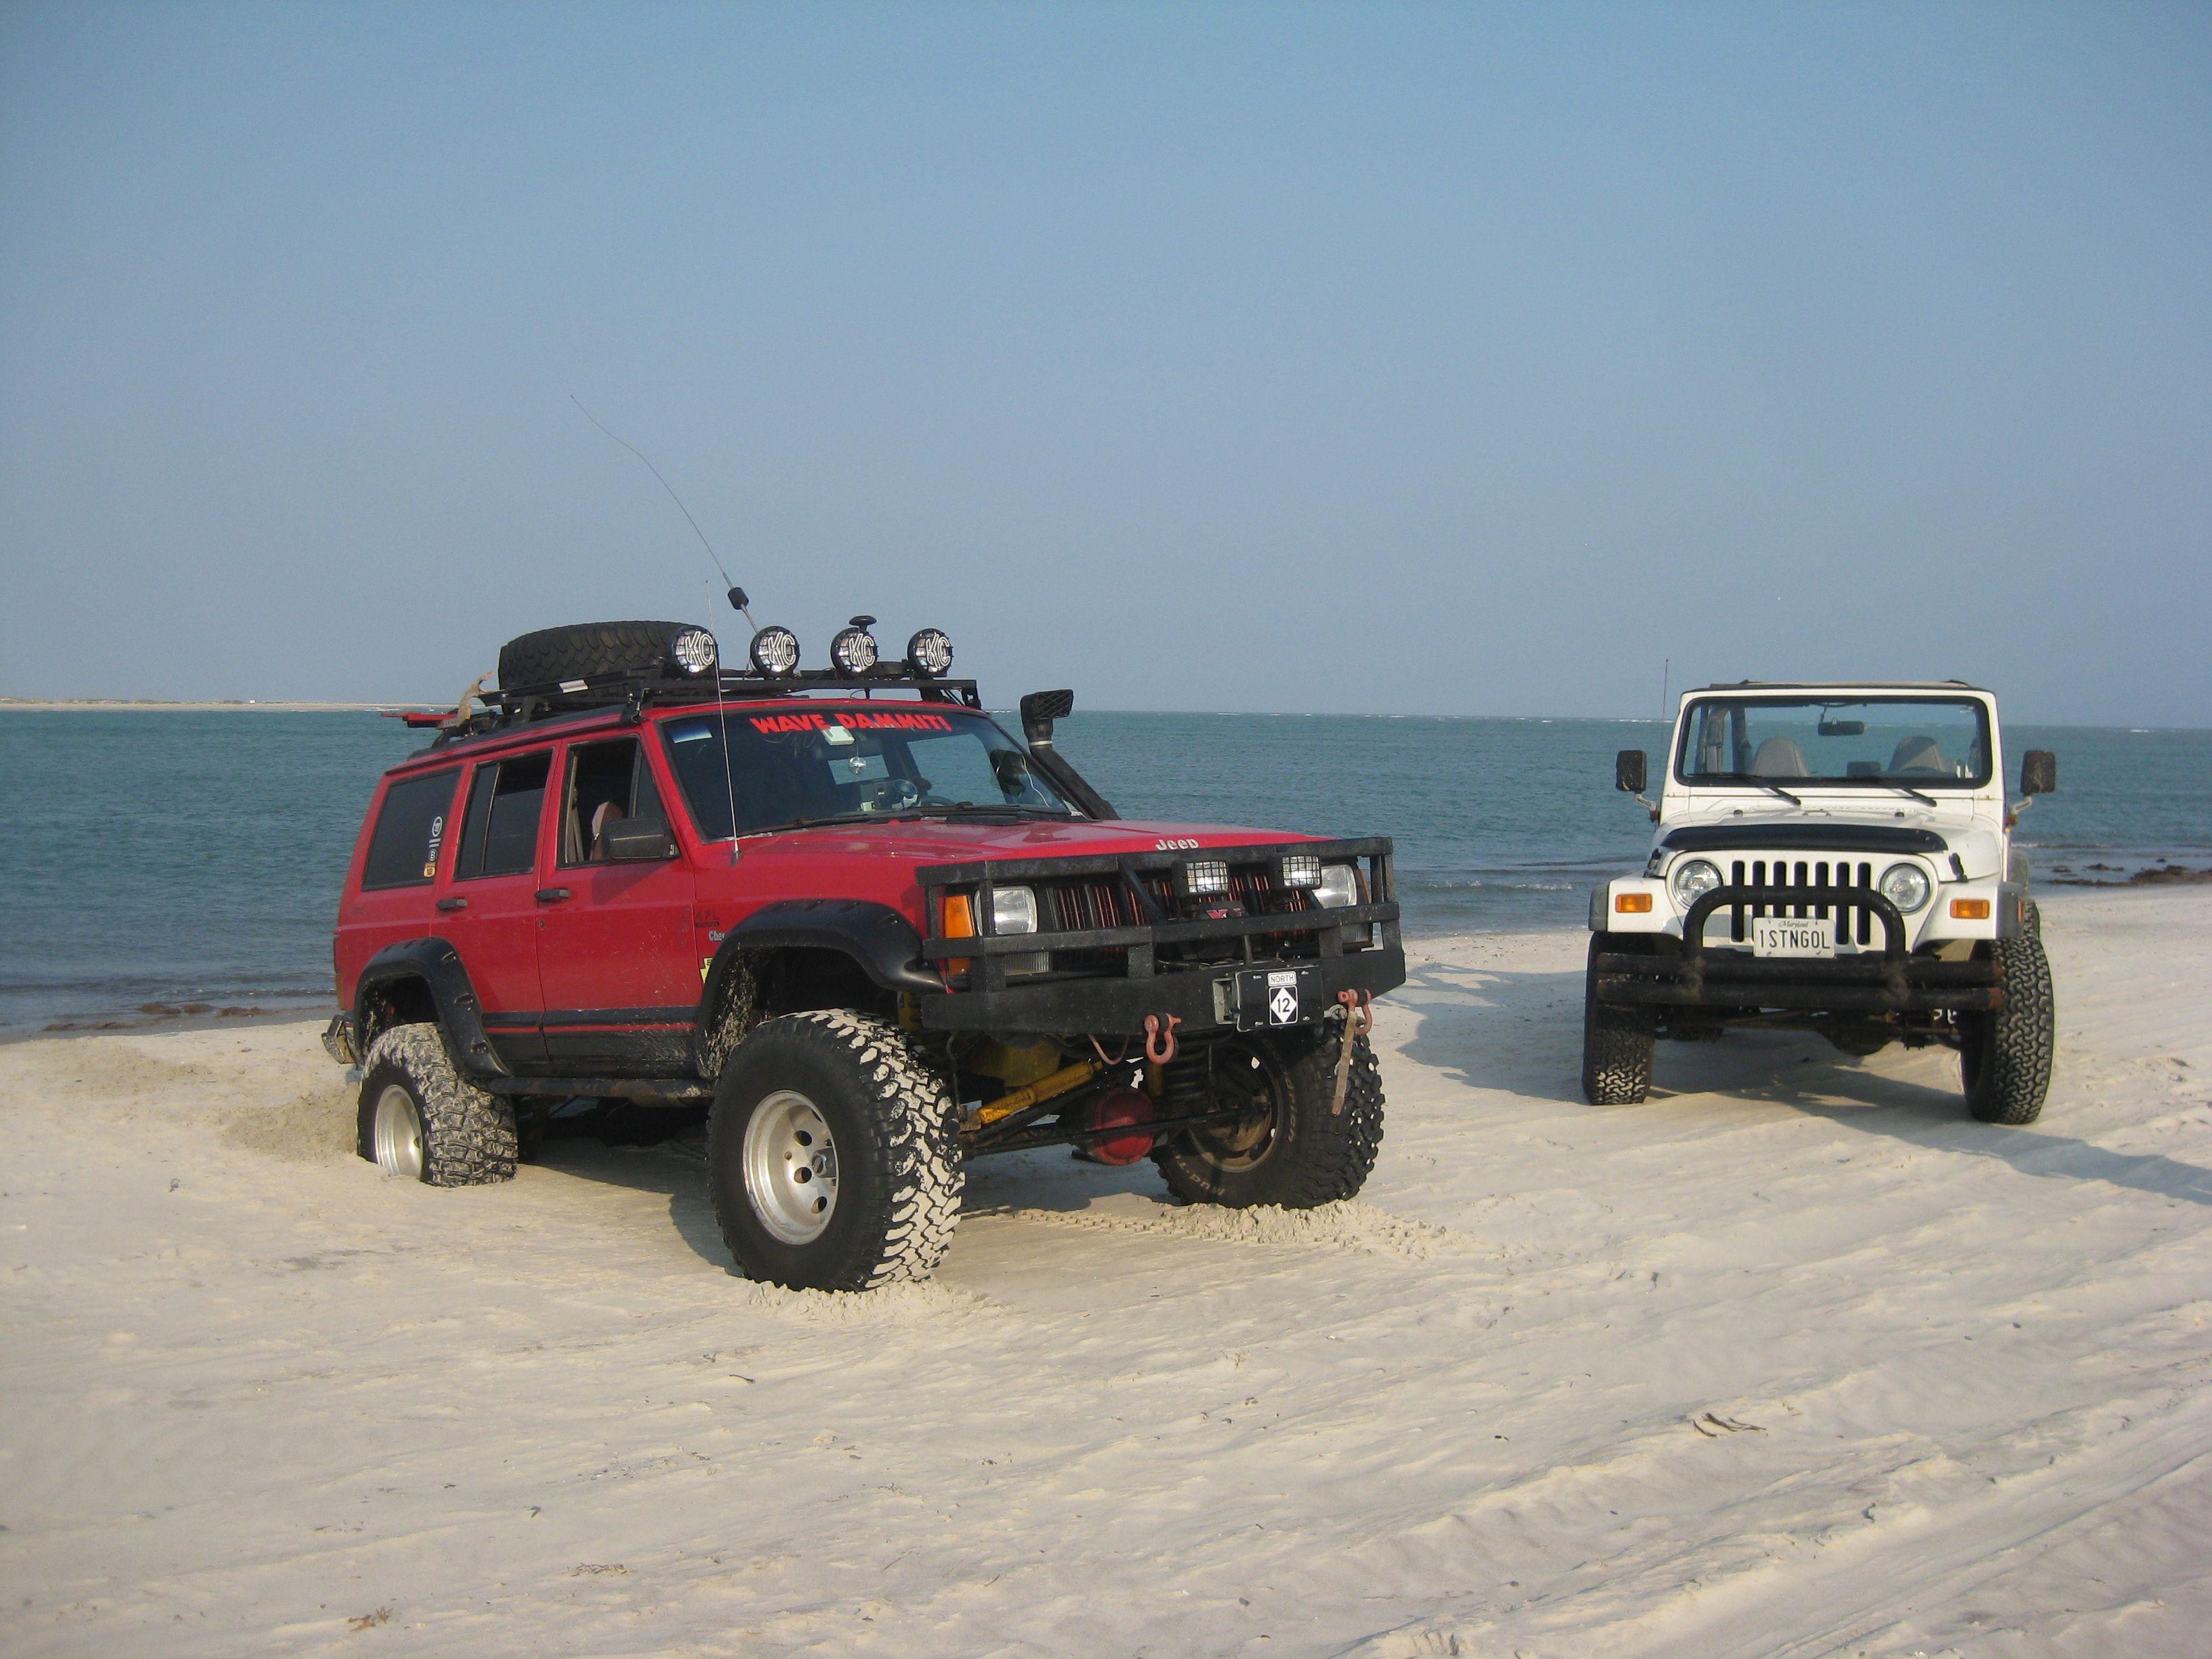 Jeep At The New River Inlet North Carolina Jeep Xj Jeep Xj Mods Jeep Cherokee